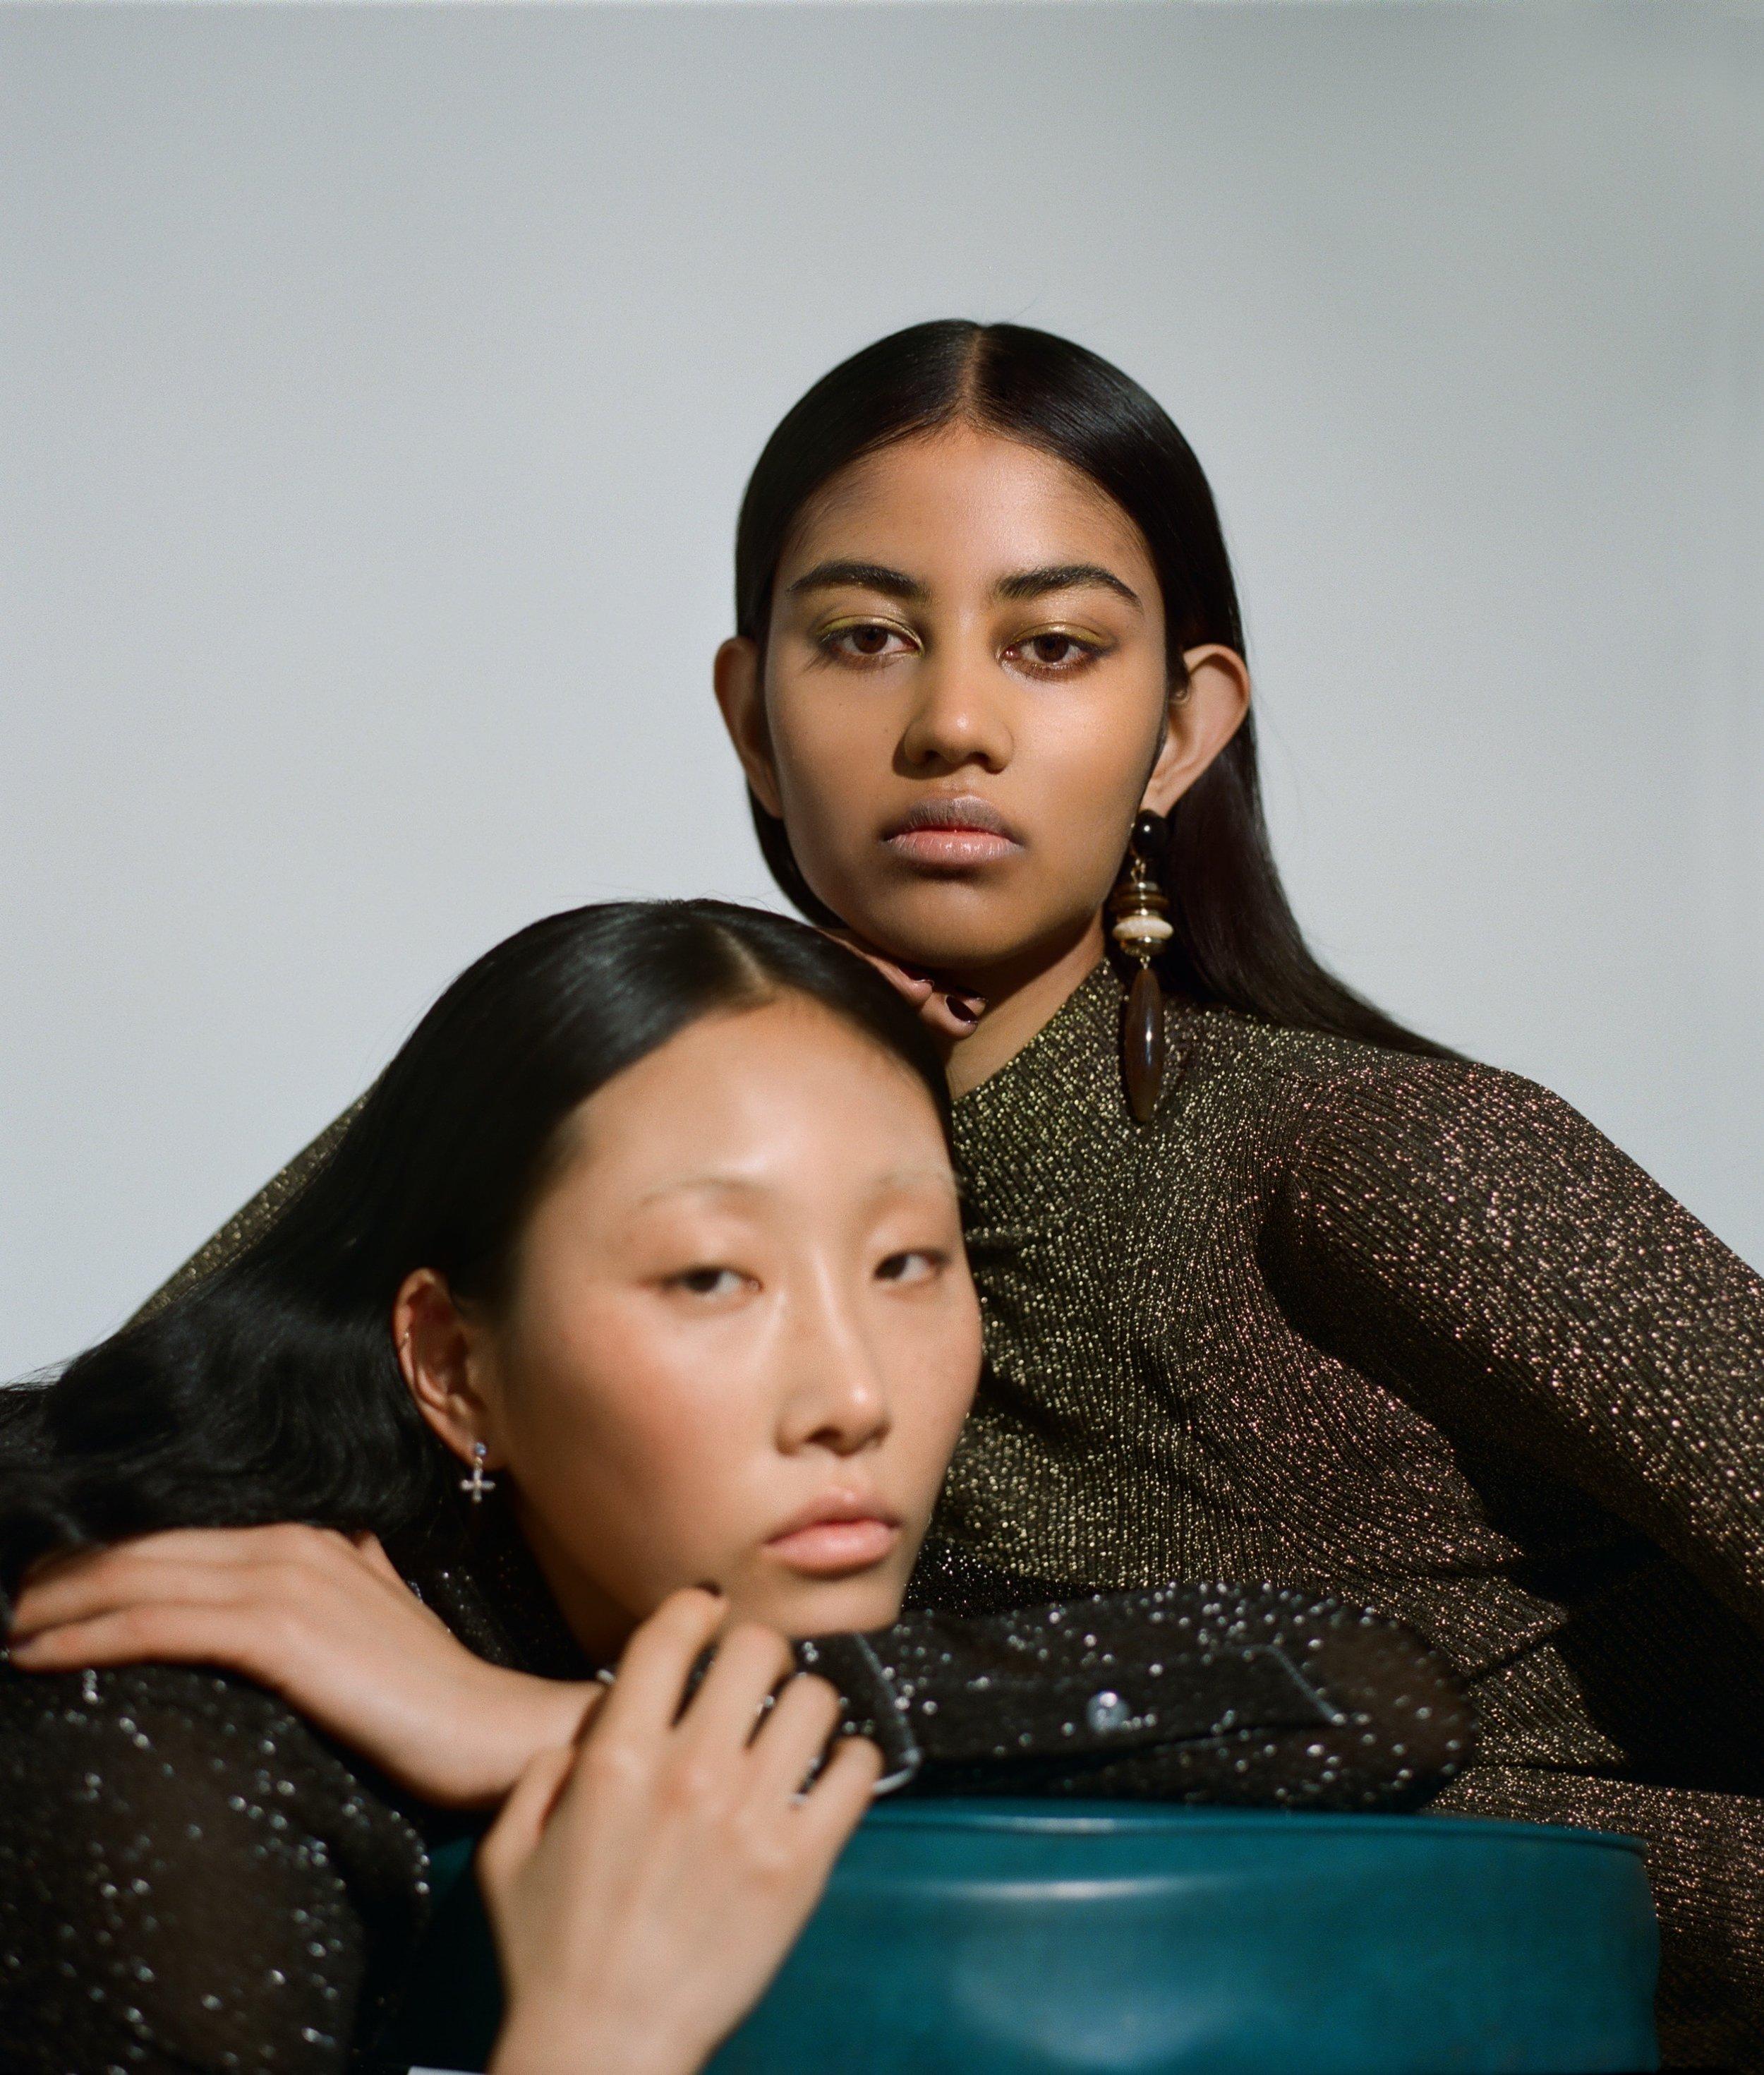 Lim Lee wears Acne Studios, Varsha wears Sandro top, both wear Reliquia earrings